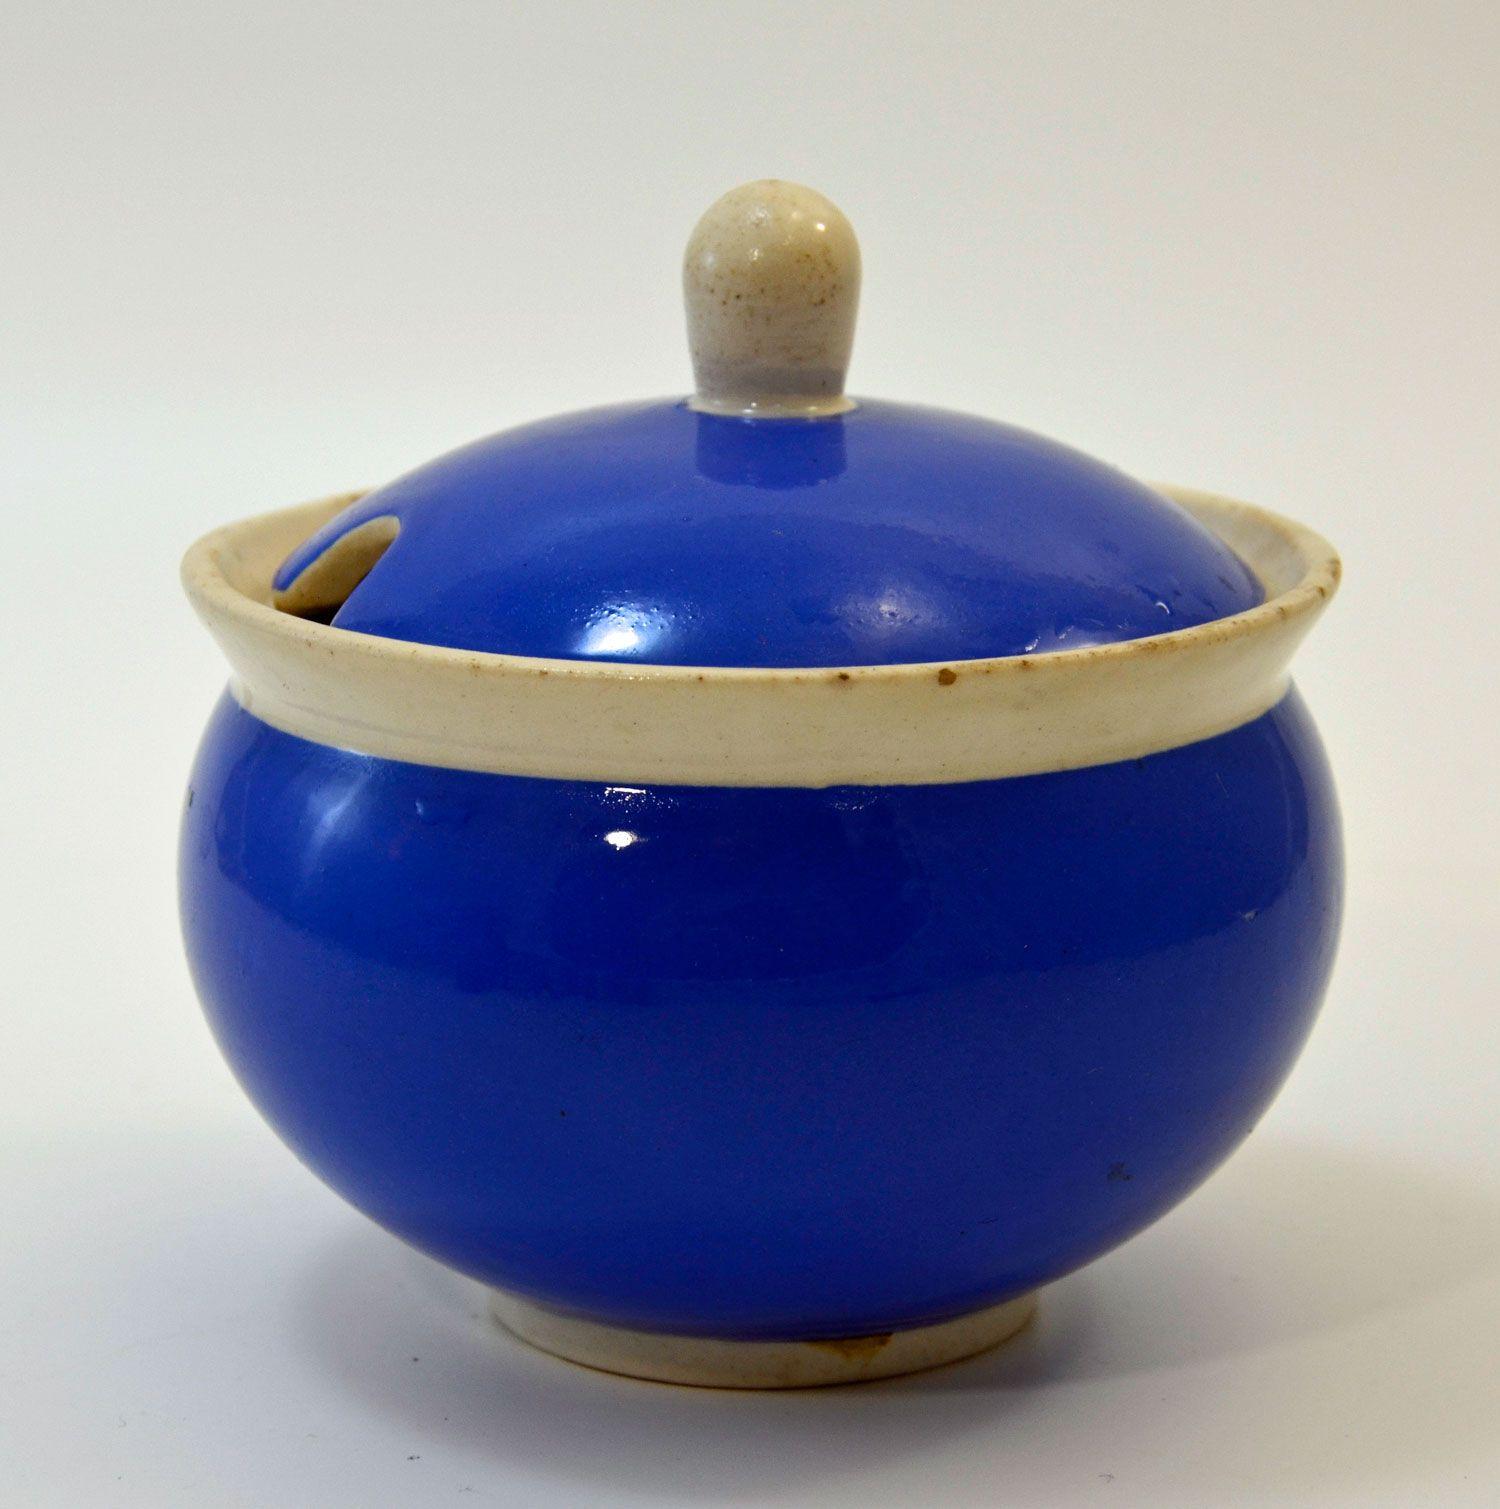 53f54c9e8461a7acbe00deab254ae35b Luxus Villeroy Und Boch Keramik Dekorationen